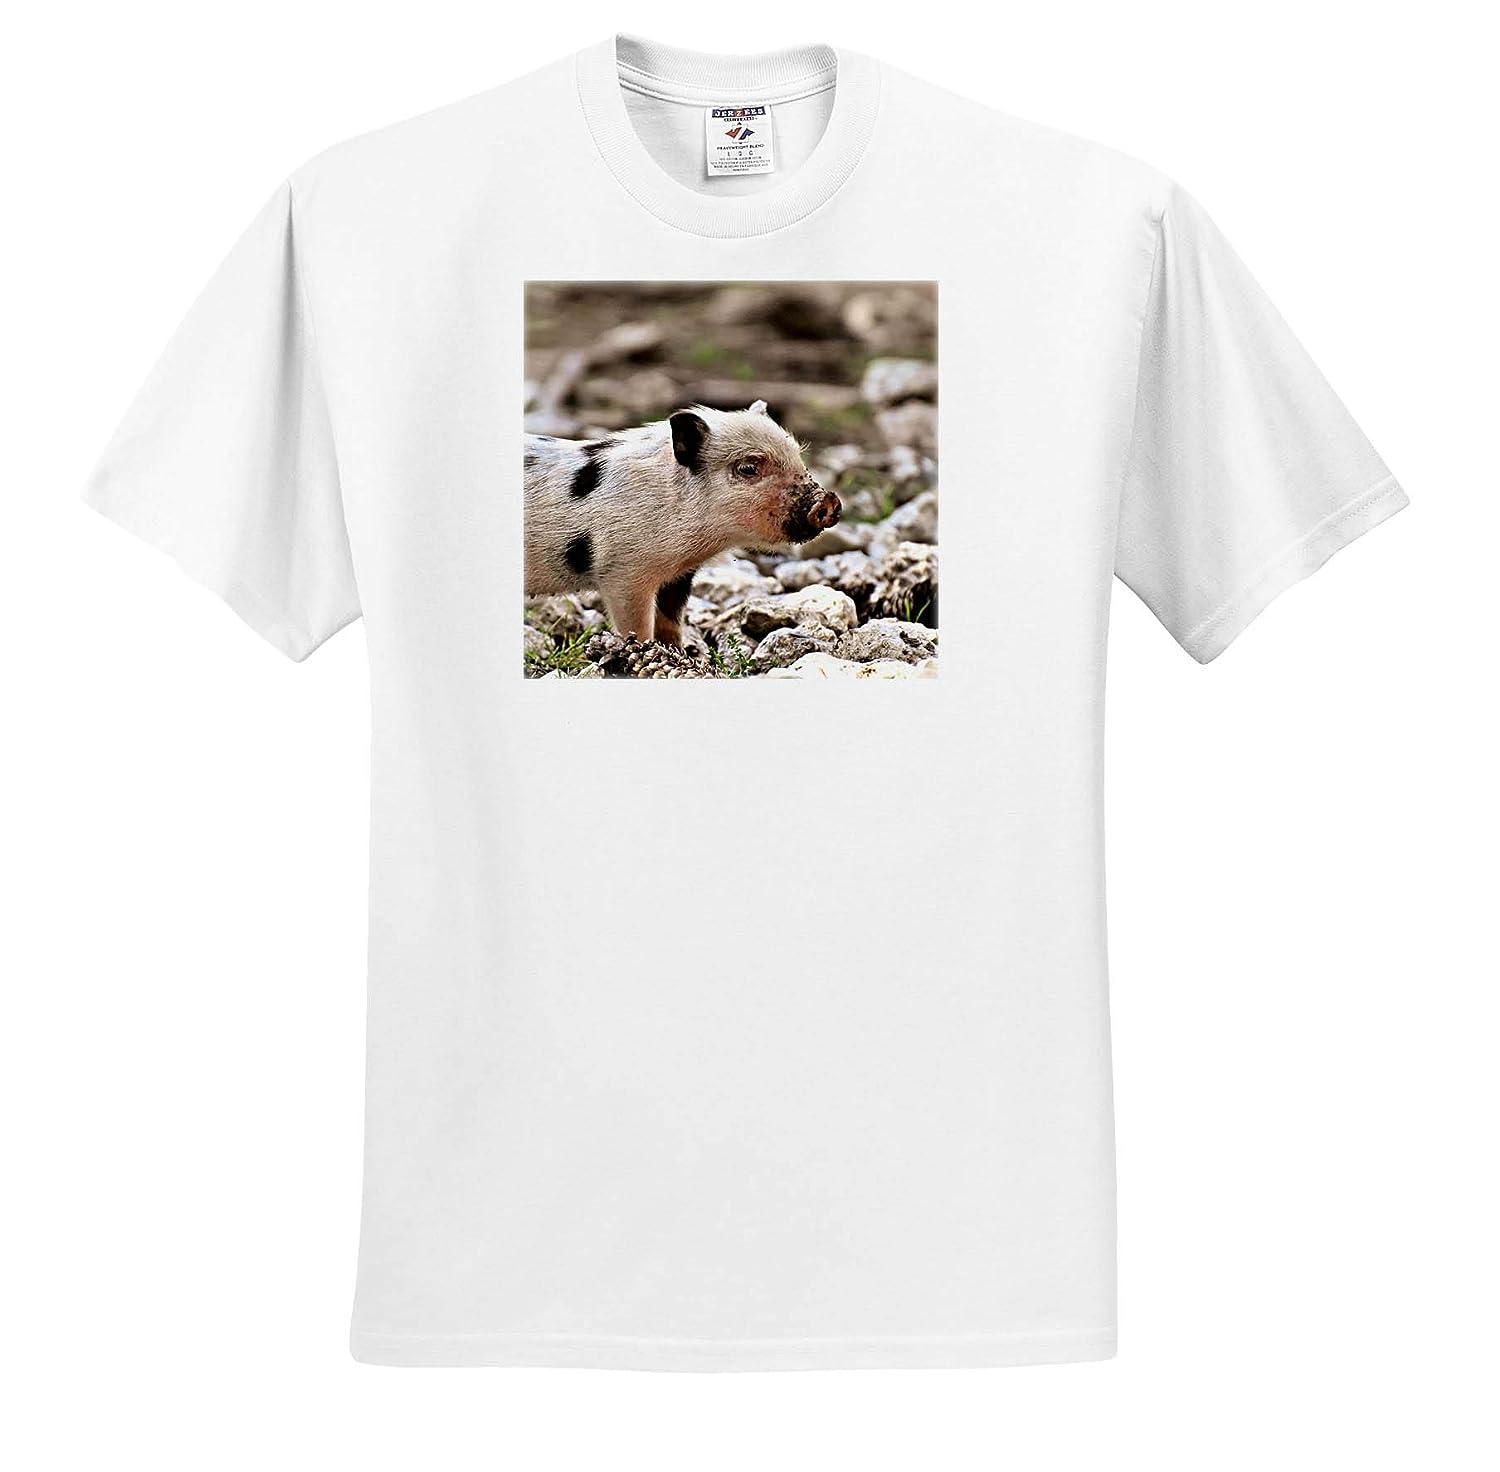 T-Shirts Pig Piglet Farm Animal in The Wildlife Nature 3dRose Sven Herkenrath Animal